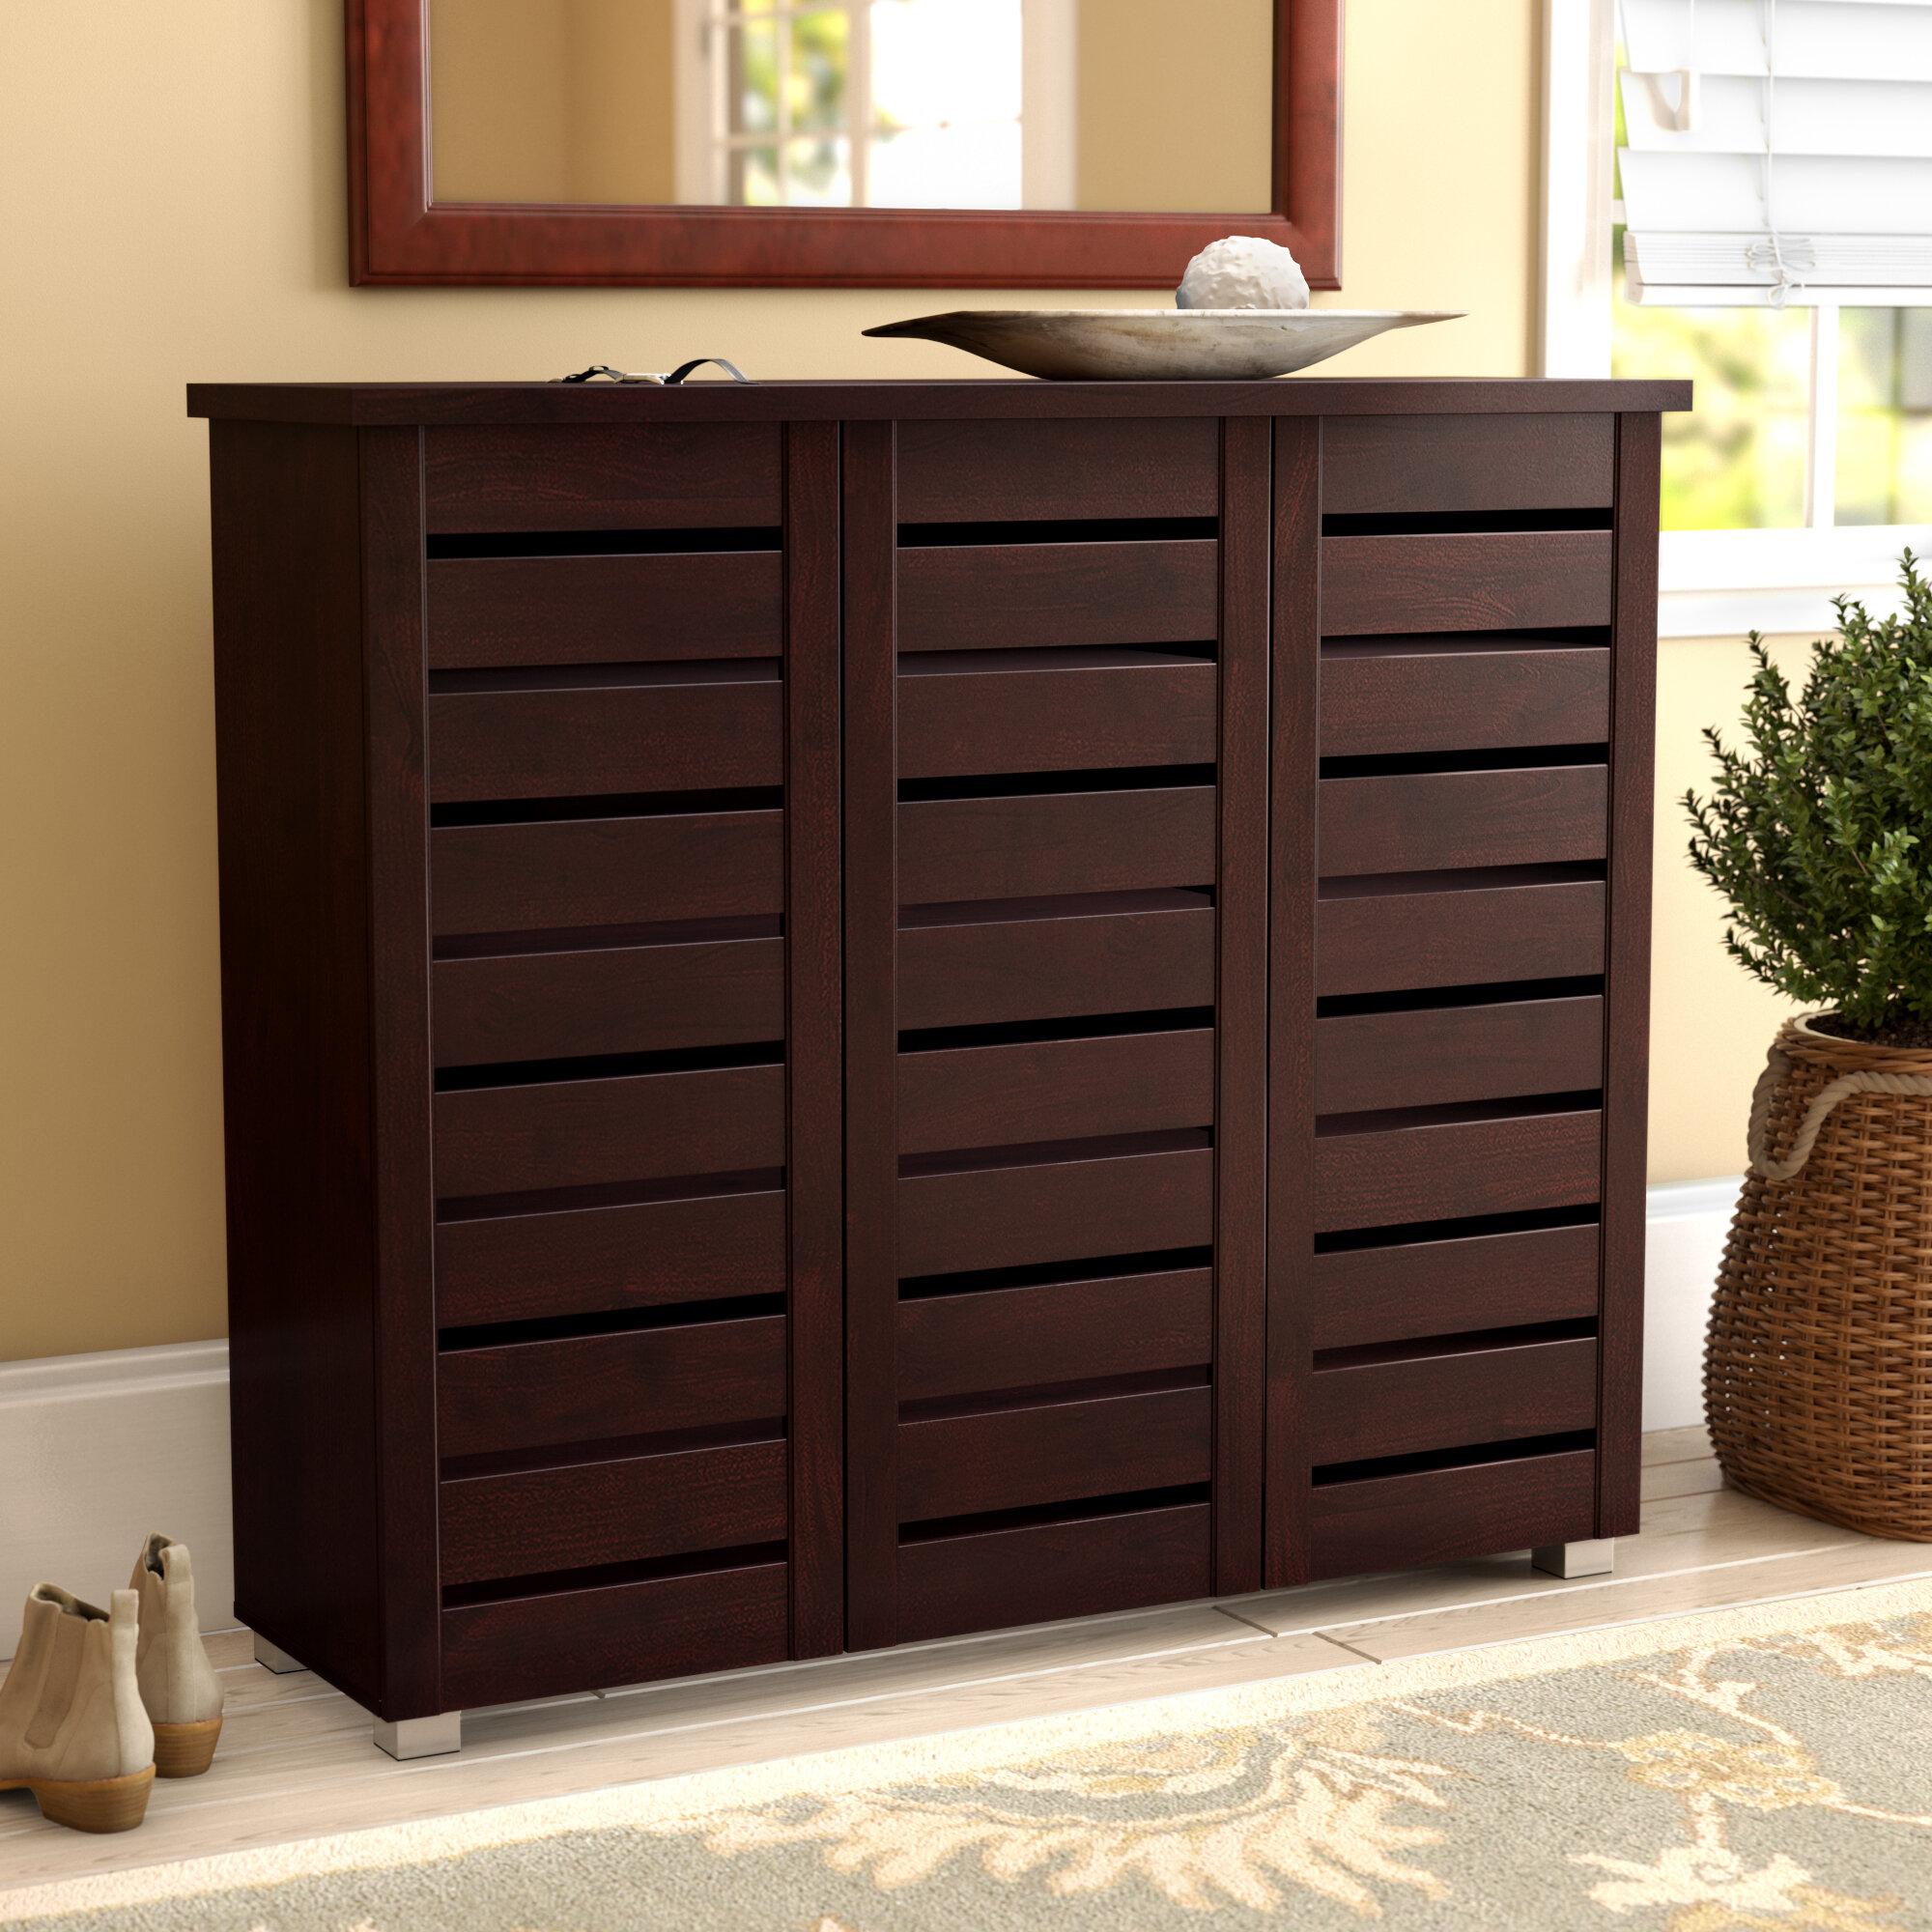 Latitude Run Ostrowski 20 Pair Shoe Storage Cabinet Reviews Wayfair